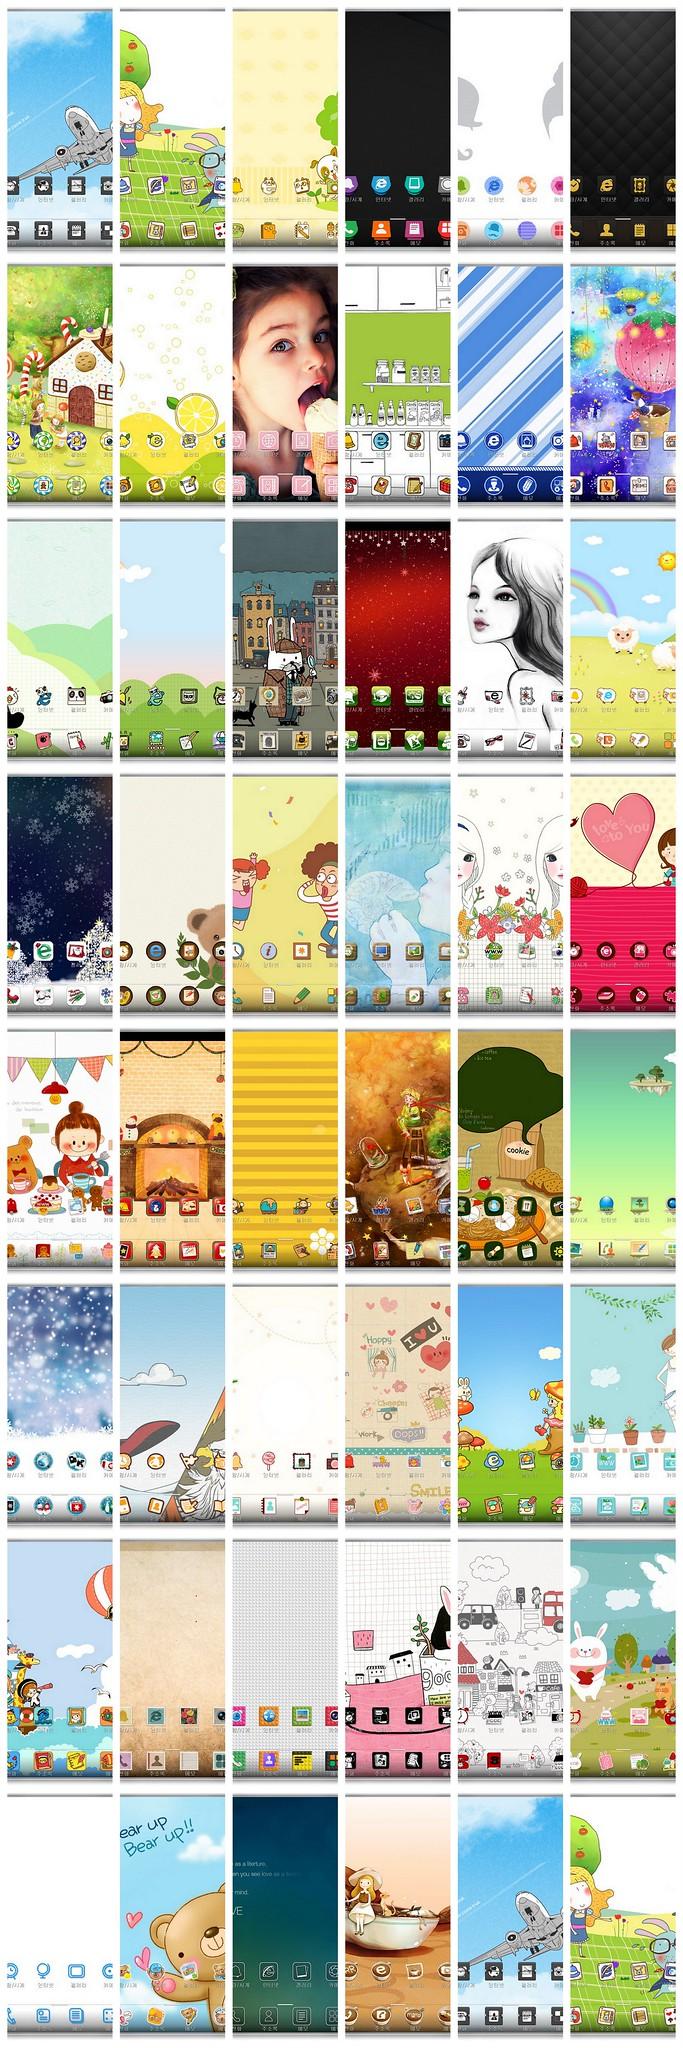 LG SmartWorld 韓國免費主題下載 (帶預覽圖) @3C 達人廖阿輝